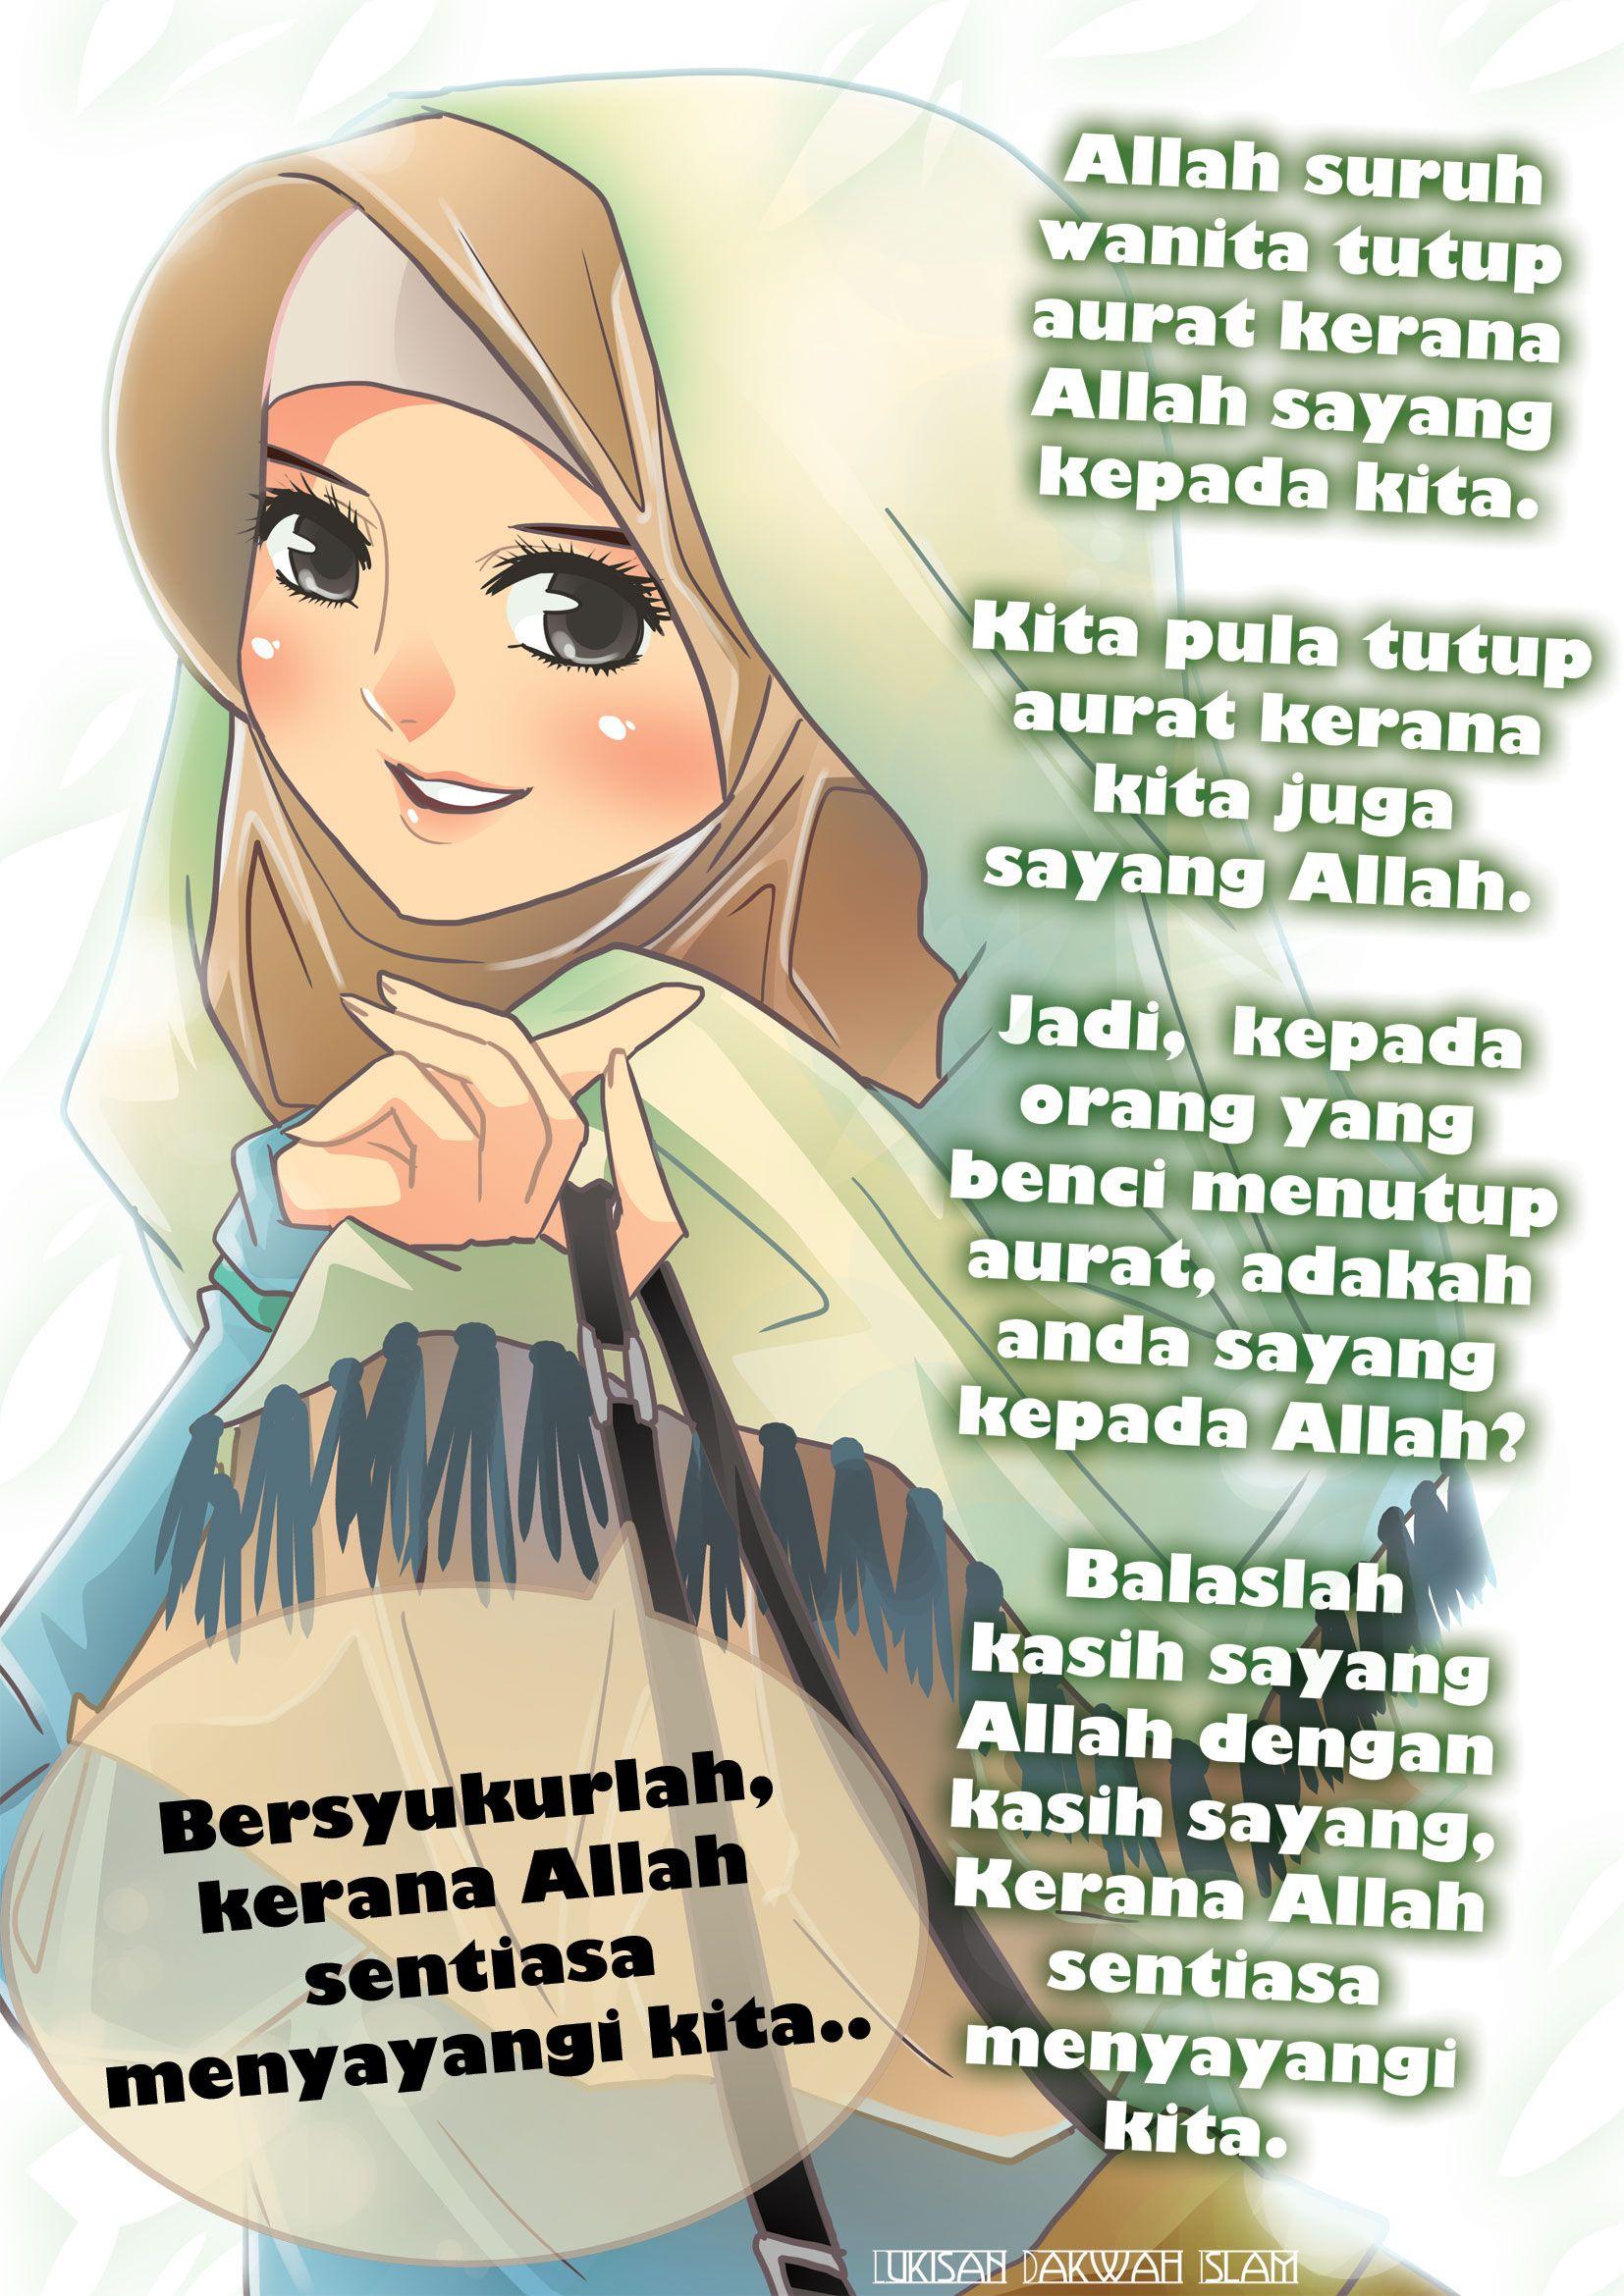 Lukisan Kartun Muslimah Bercadar